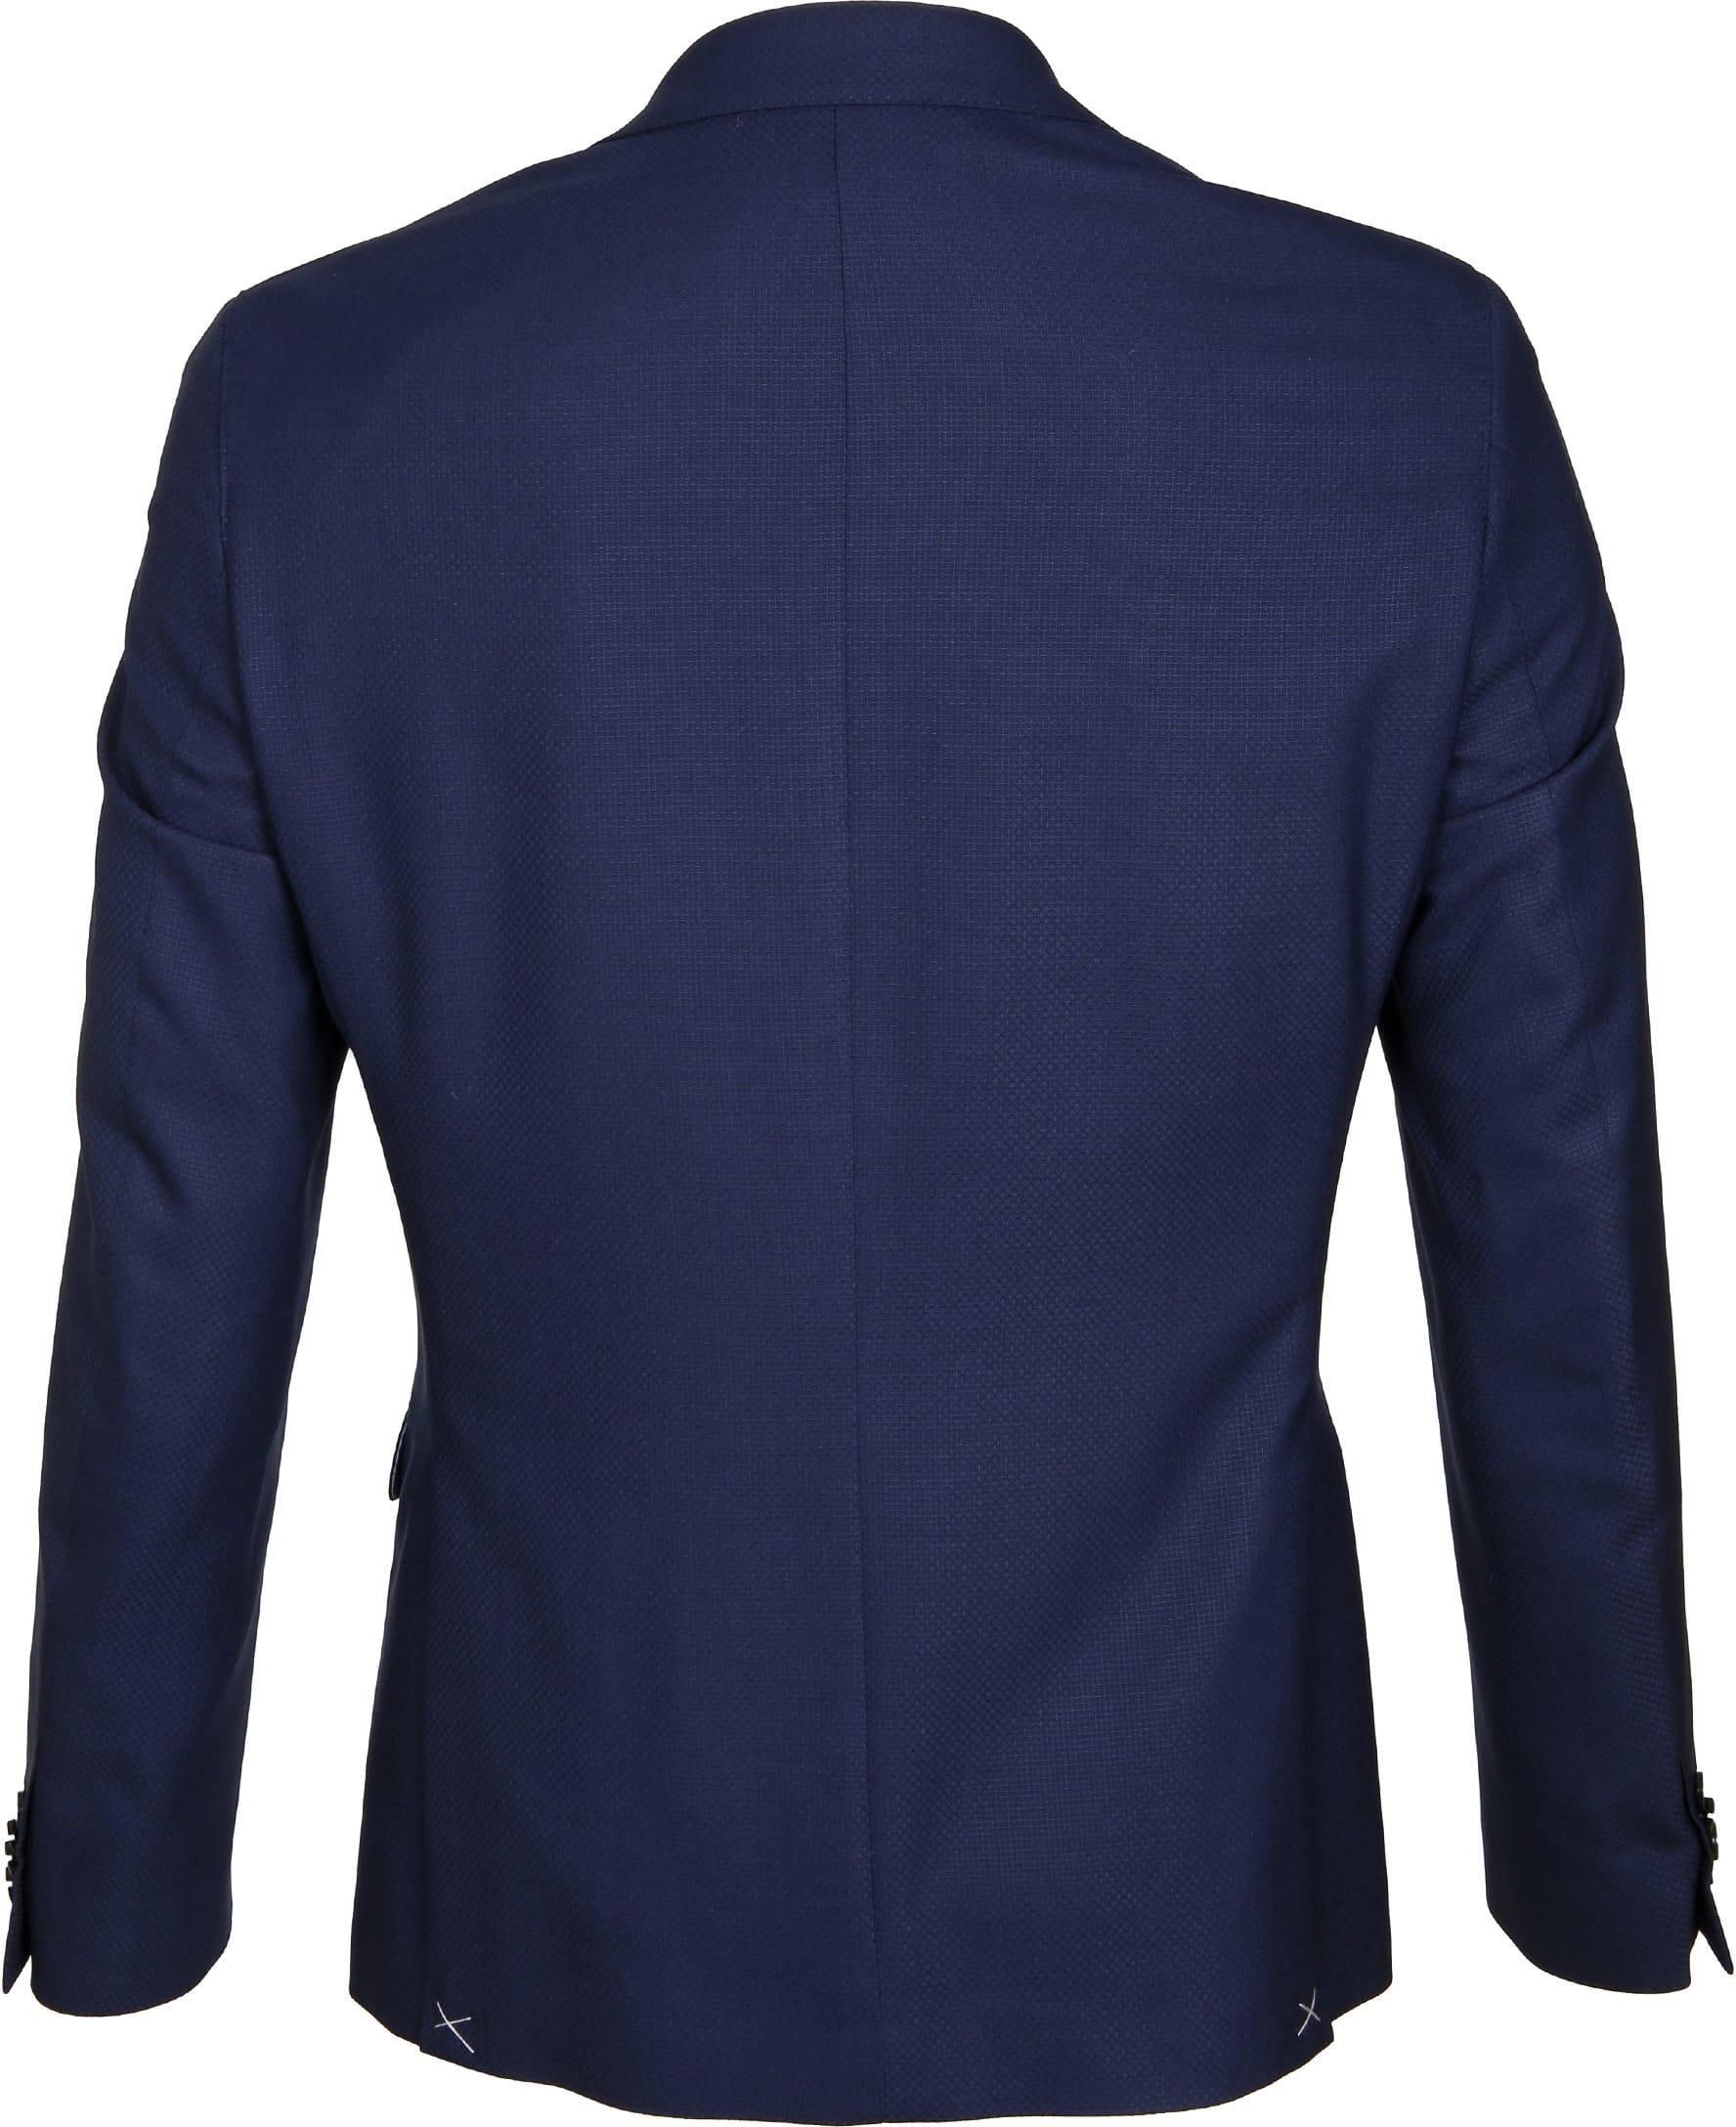 Suitable Anzug Strato Dunkelblau foto 4